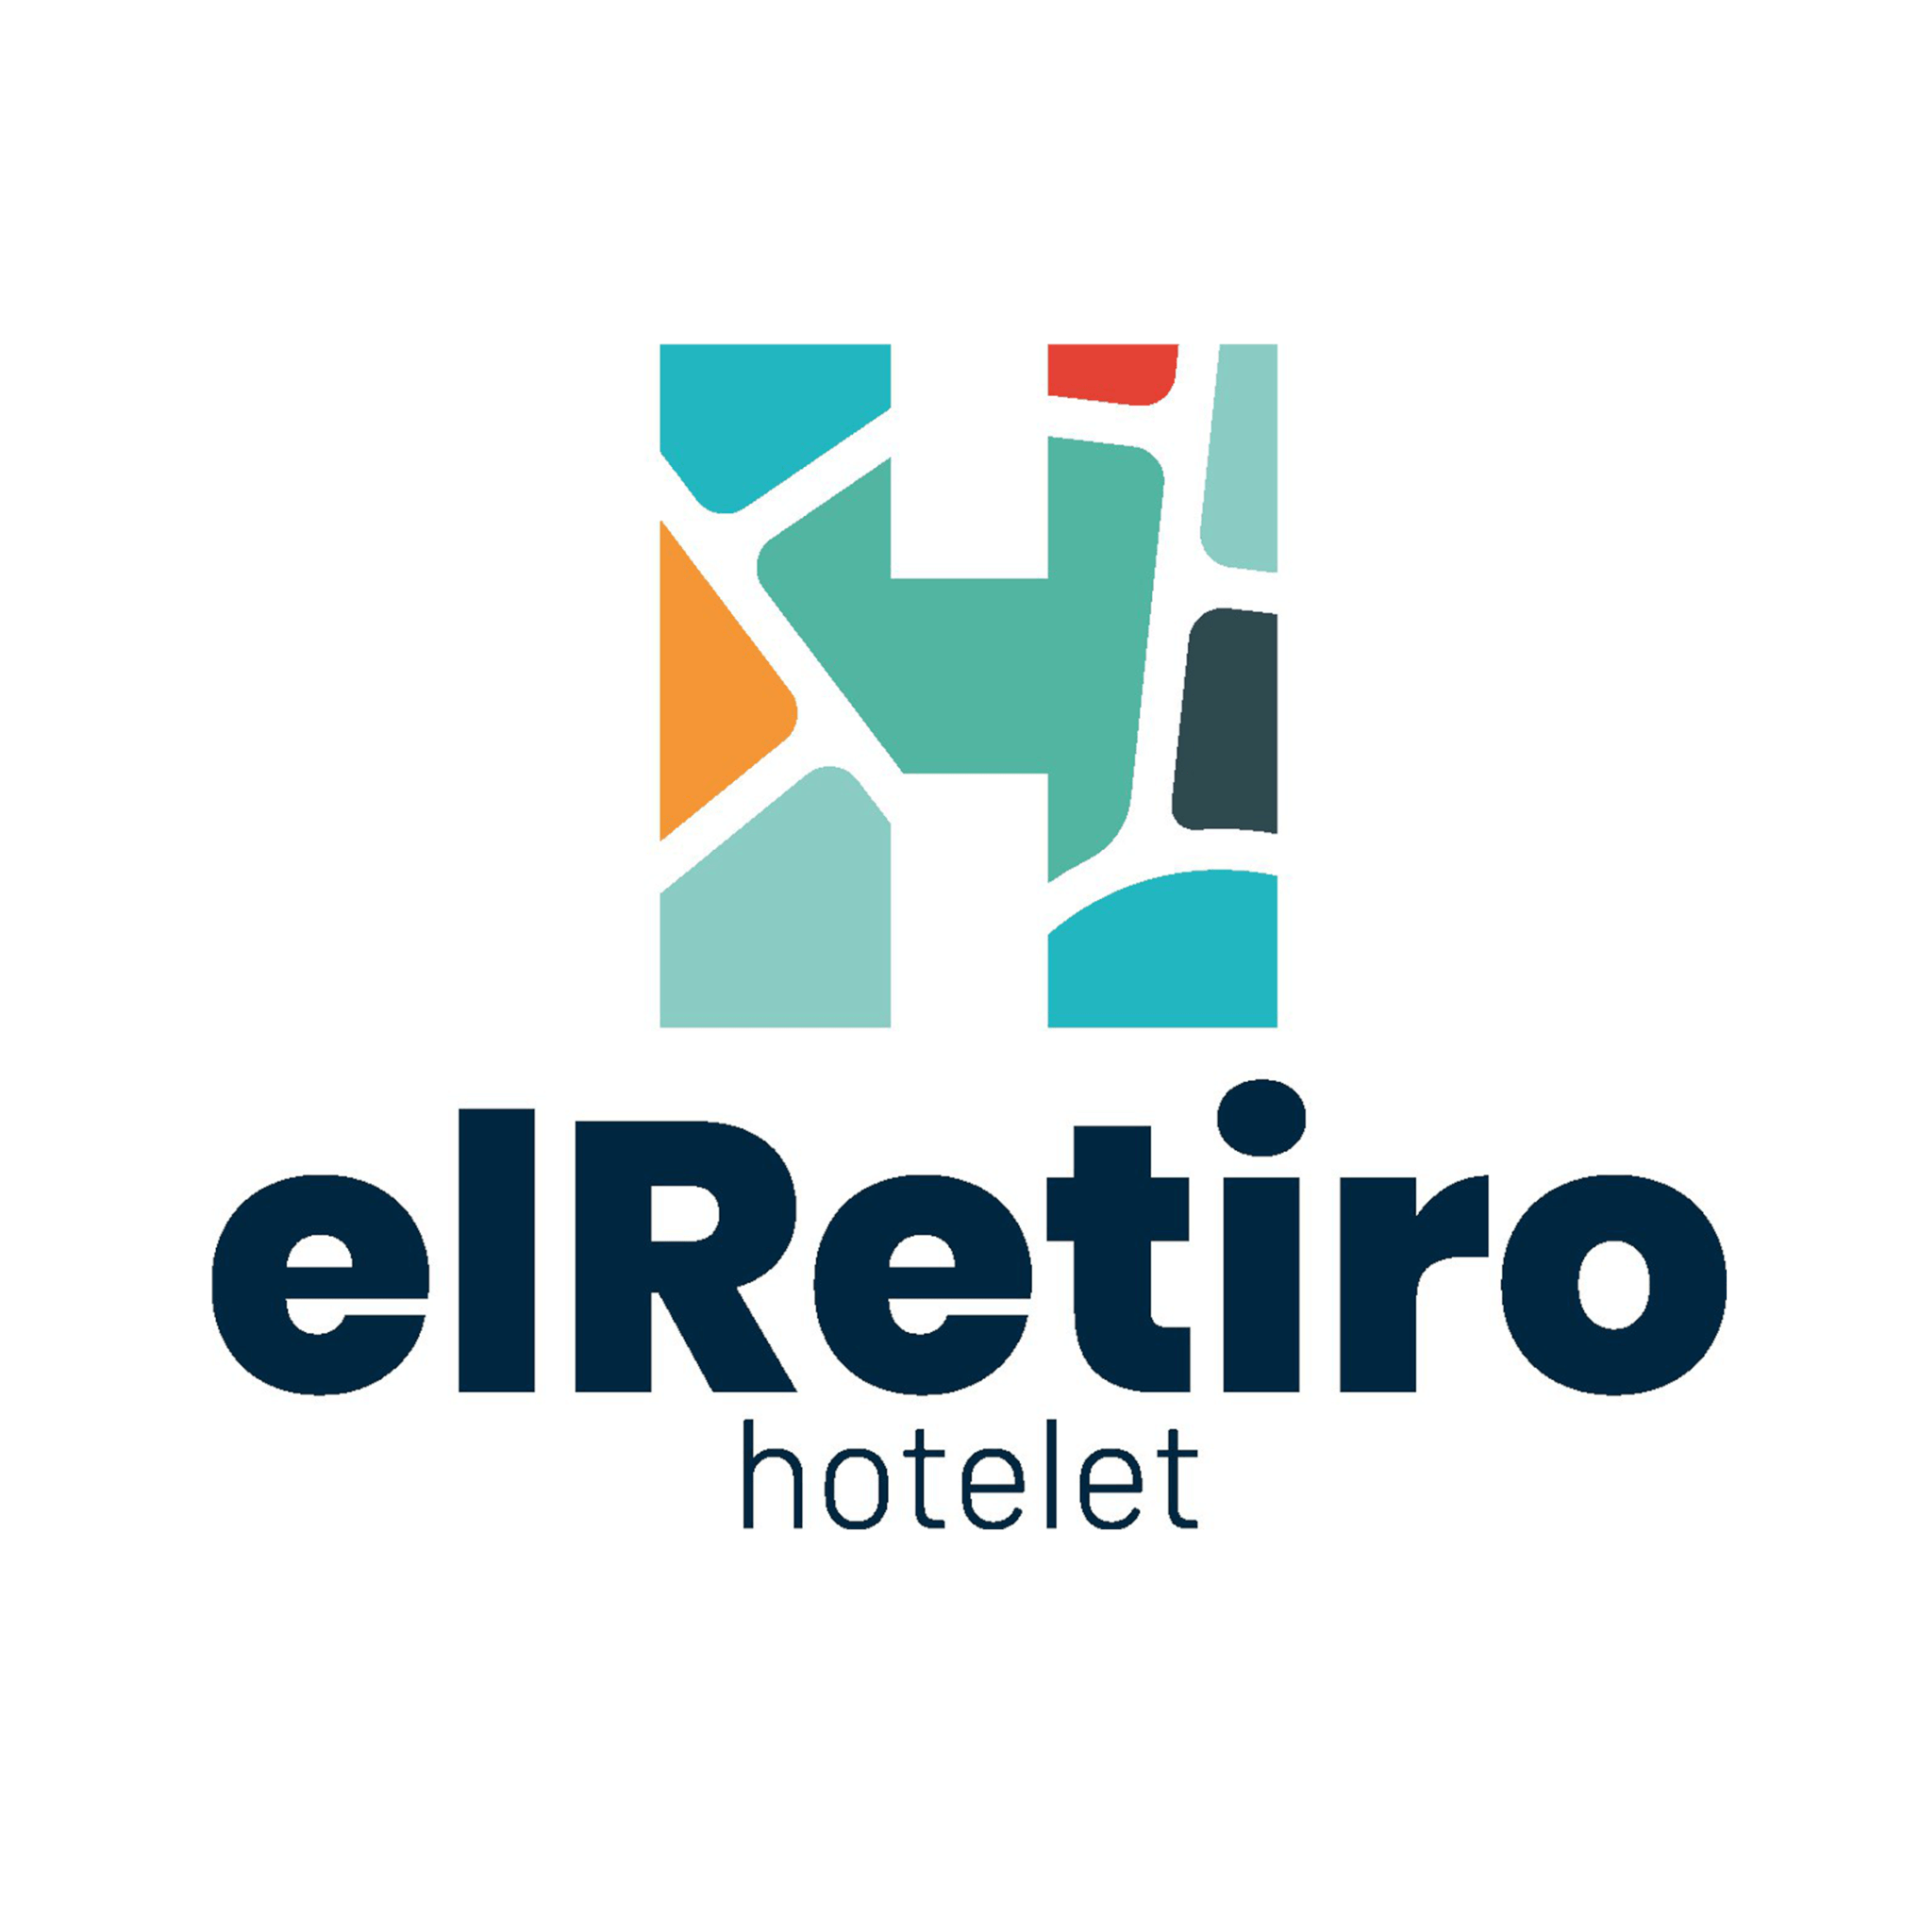 Hotelet el Retiro